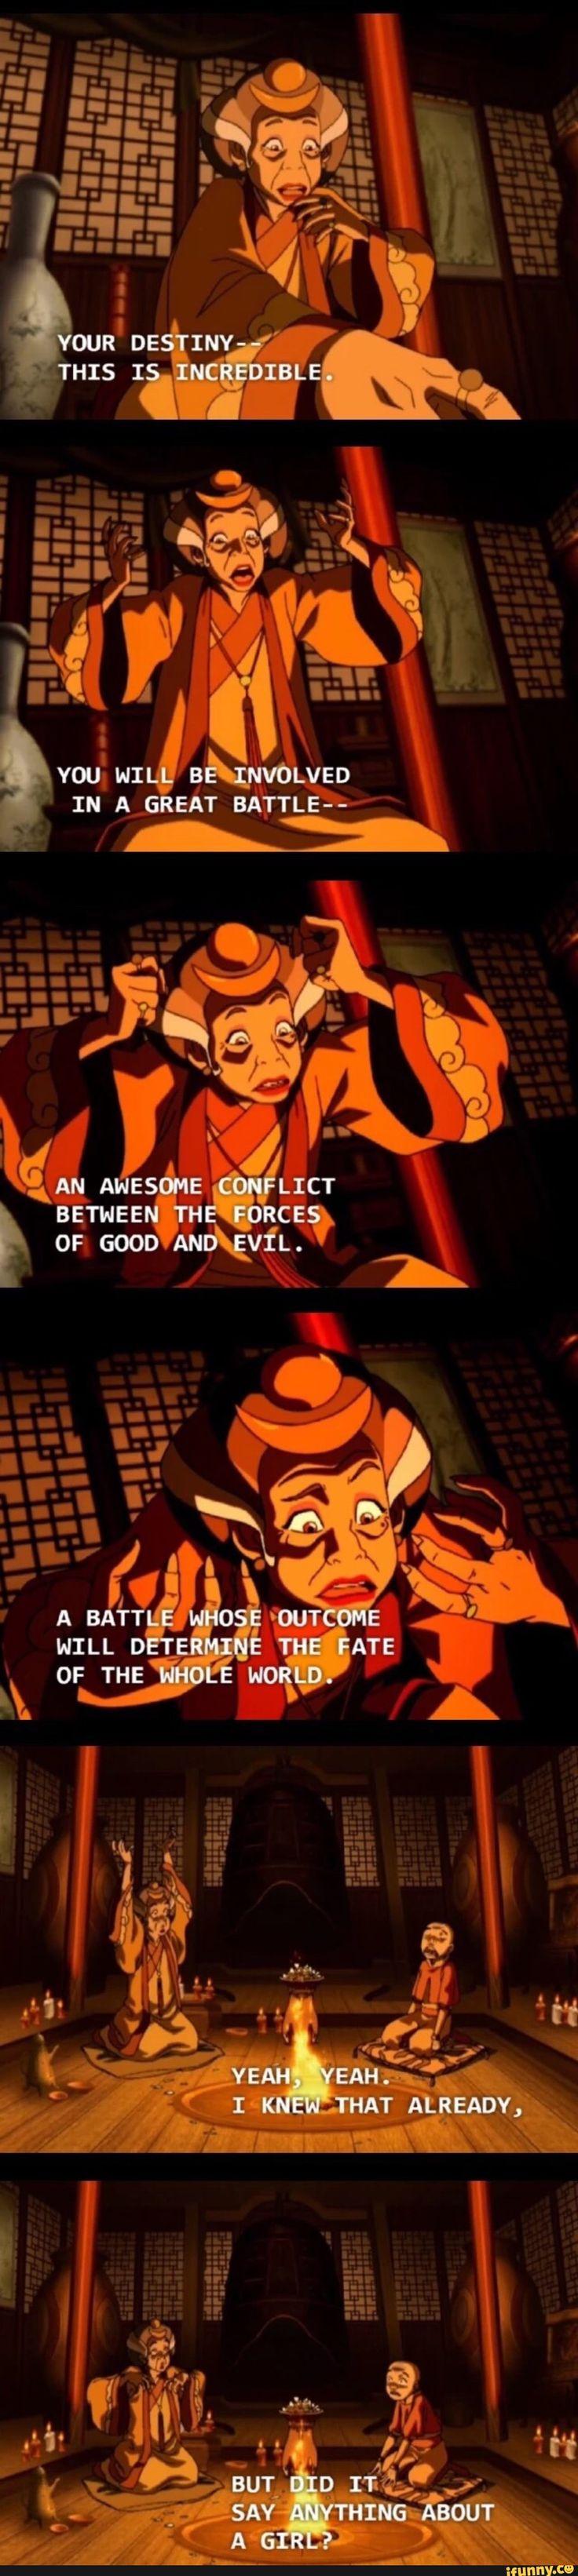 Avatar The Last Airbender & Legend of Korra